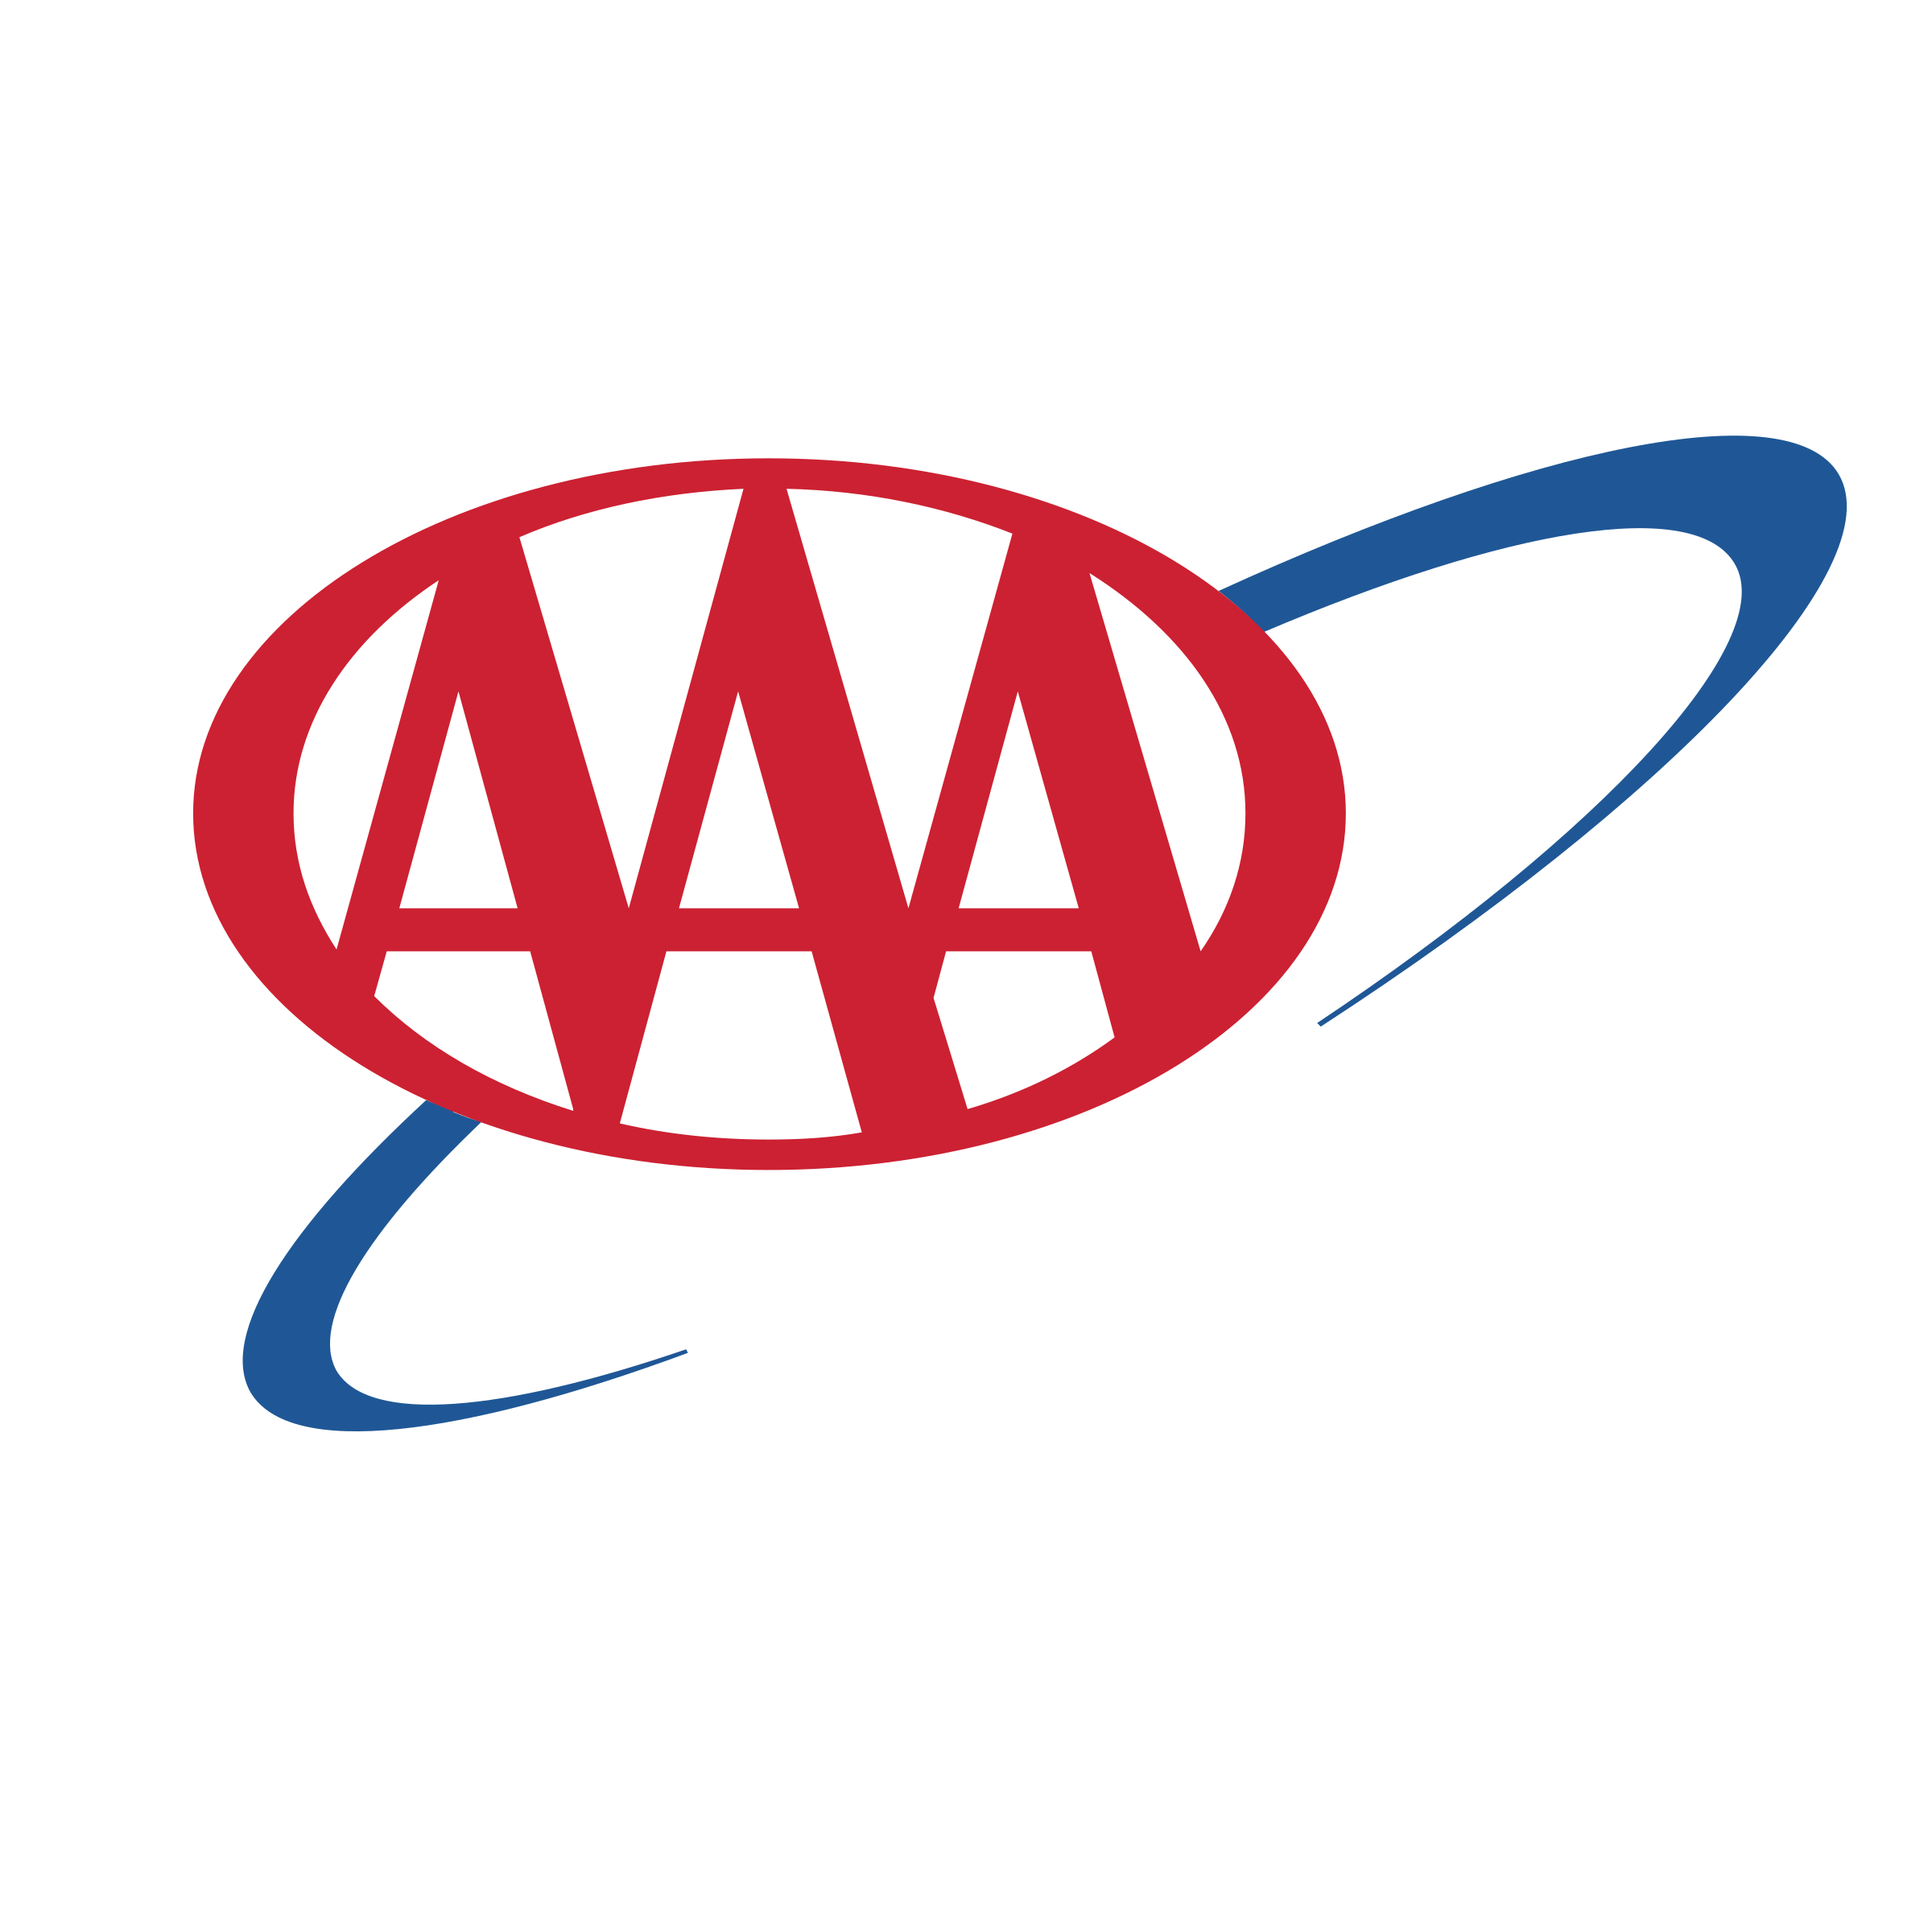 aaa-logo-png-transparent.png